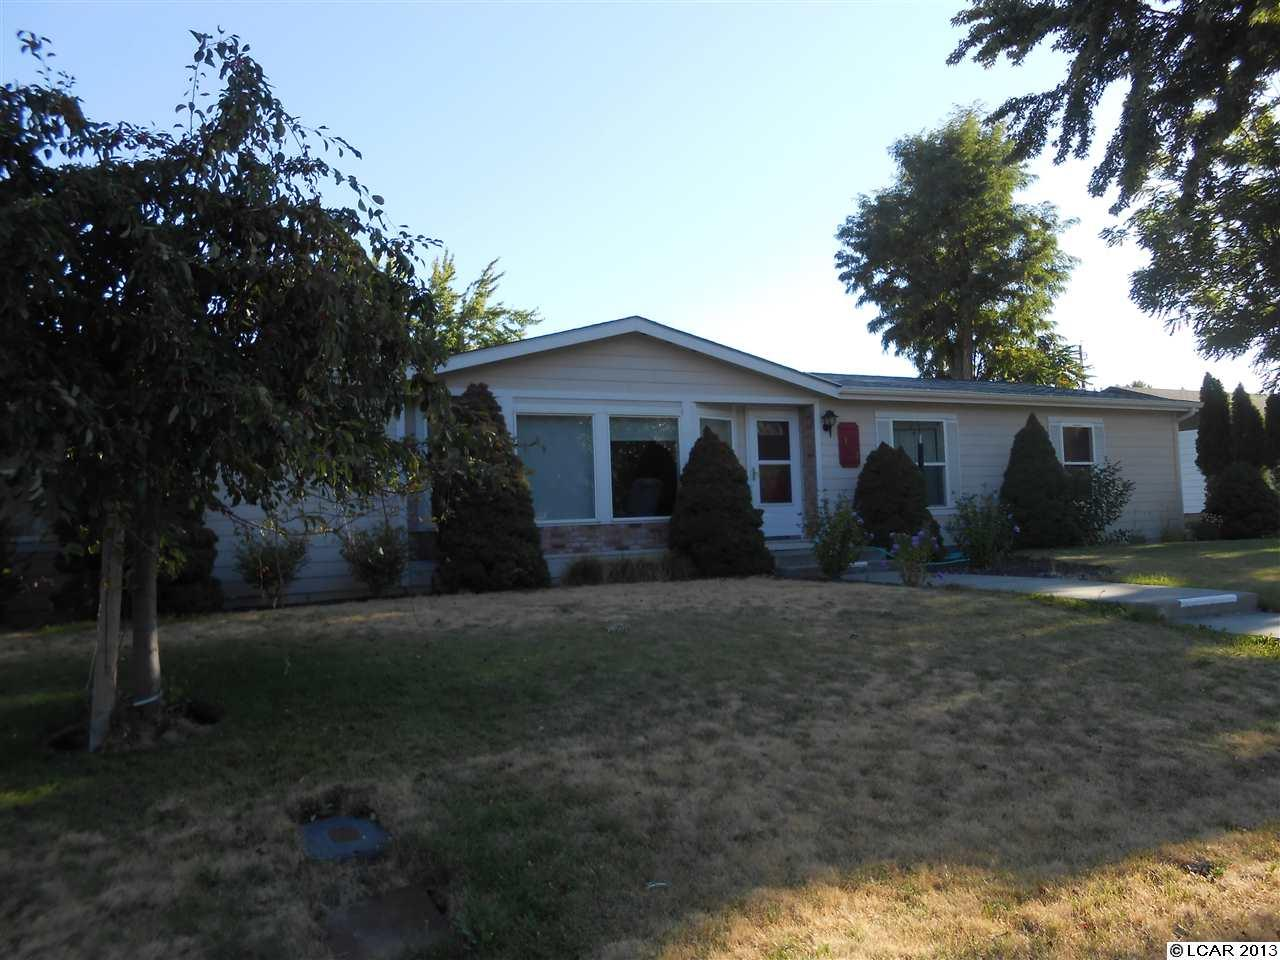 Real Estate for Sale, ListingId: 35494708, Pomeroy,WA99347